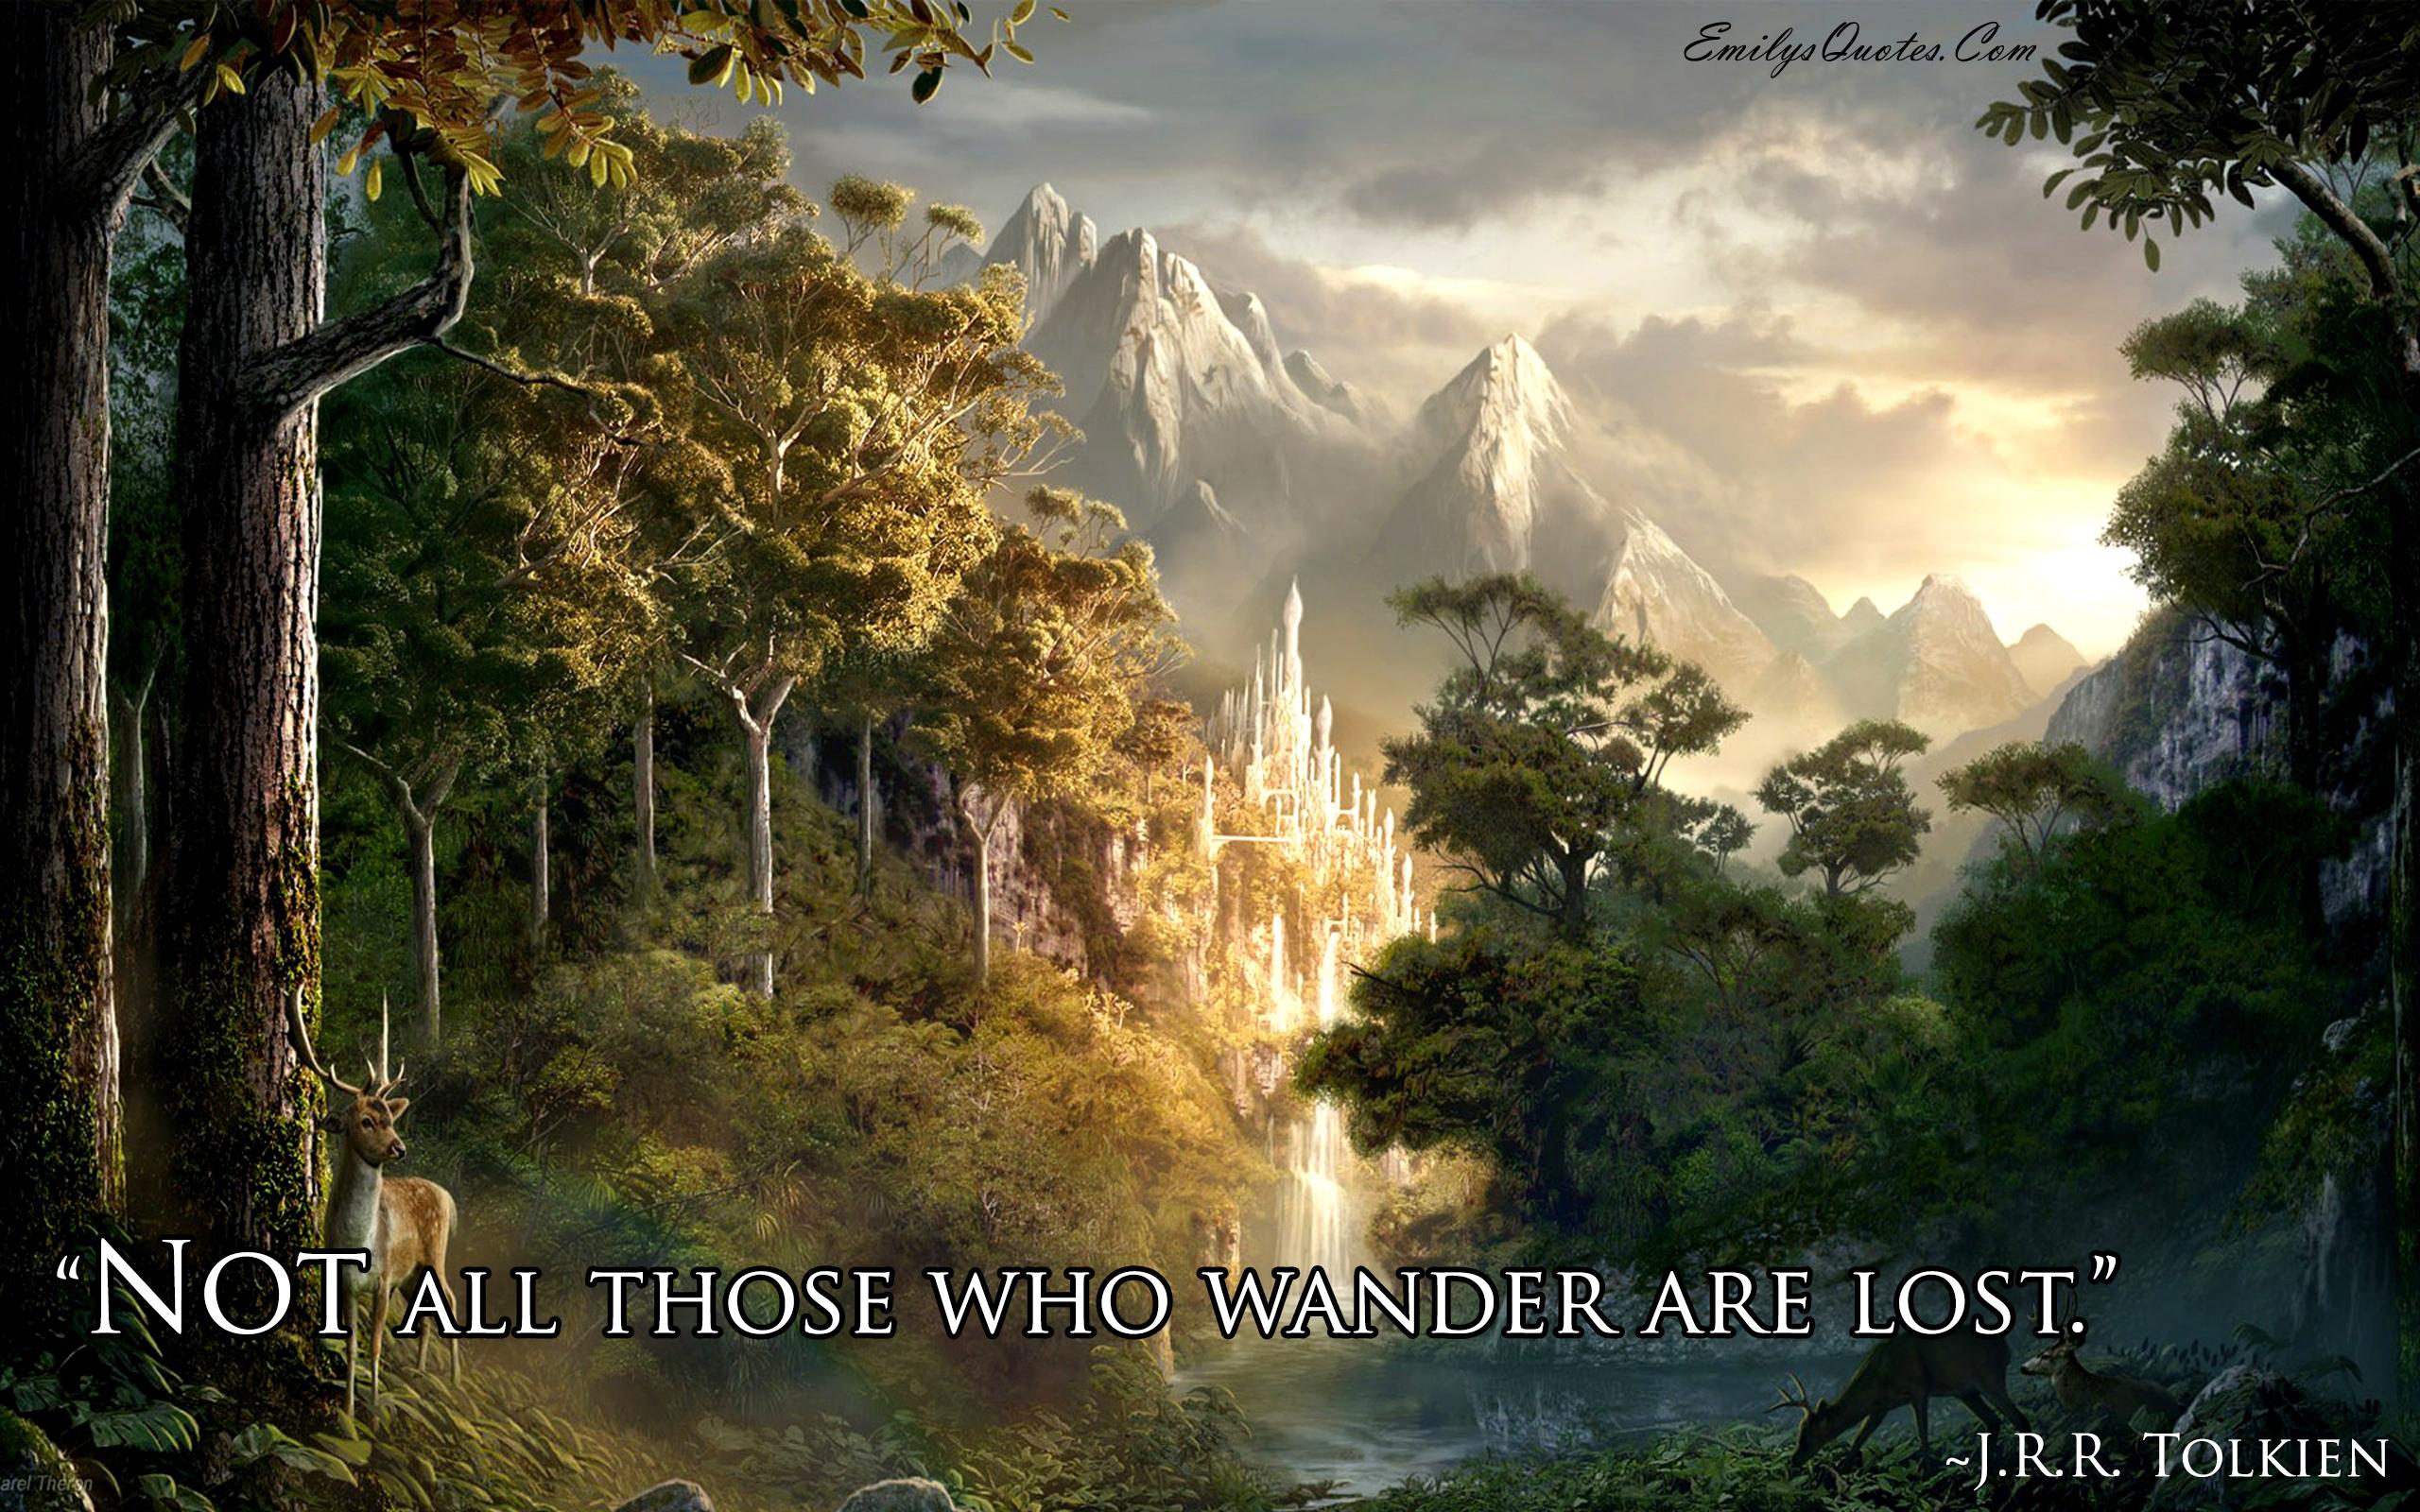 EmilysQuotes.Com - wisdom, Intelligence, wander, travel,  J.R.R. Tolkien